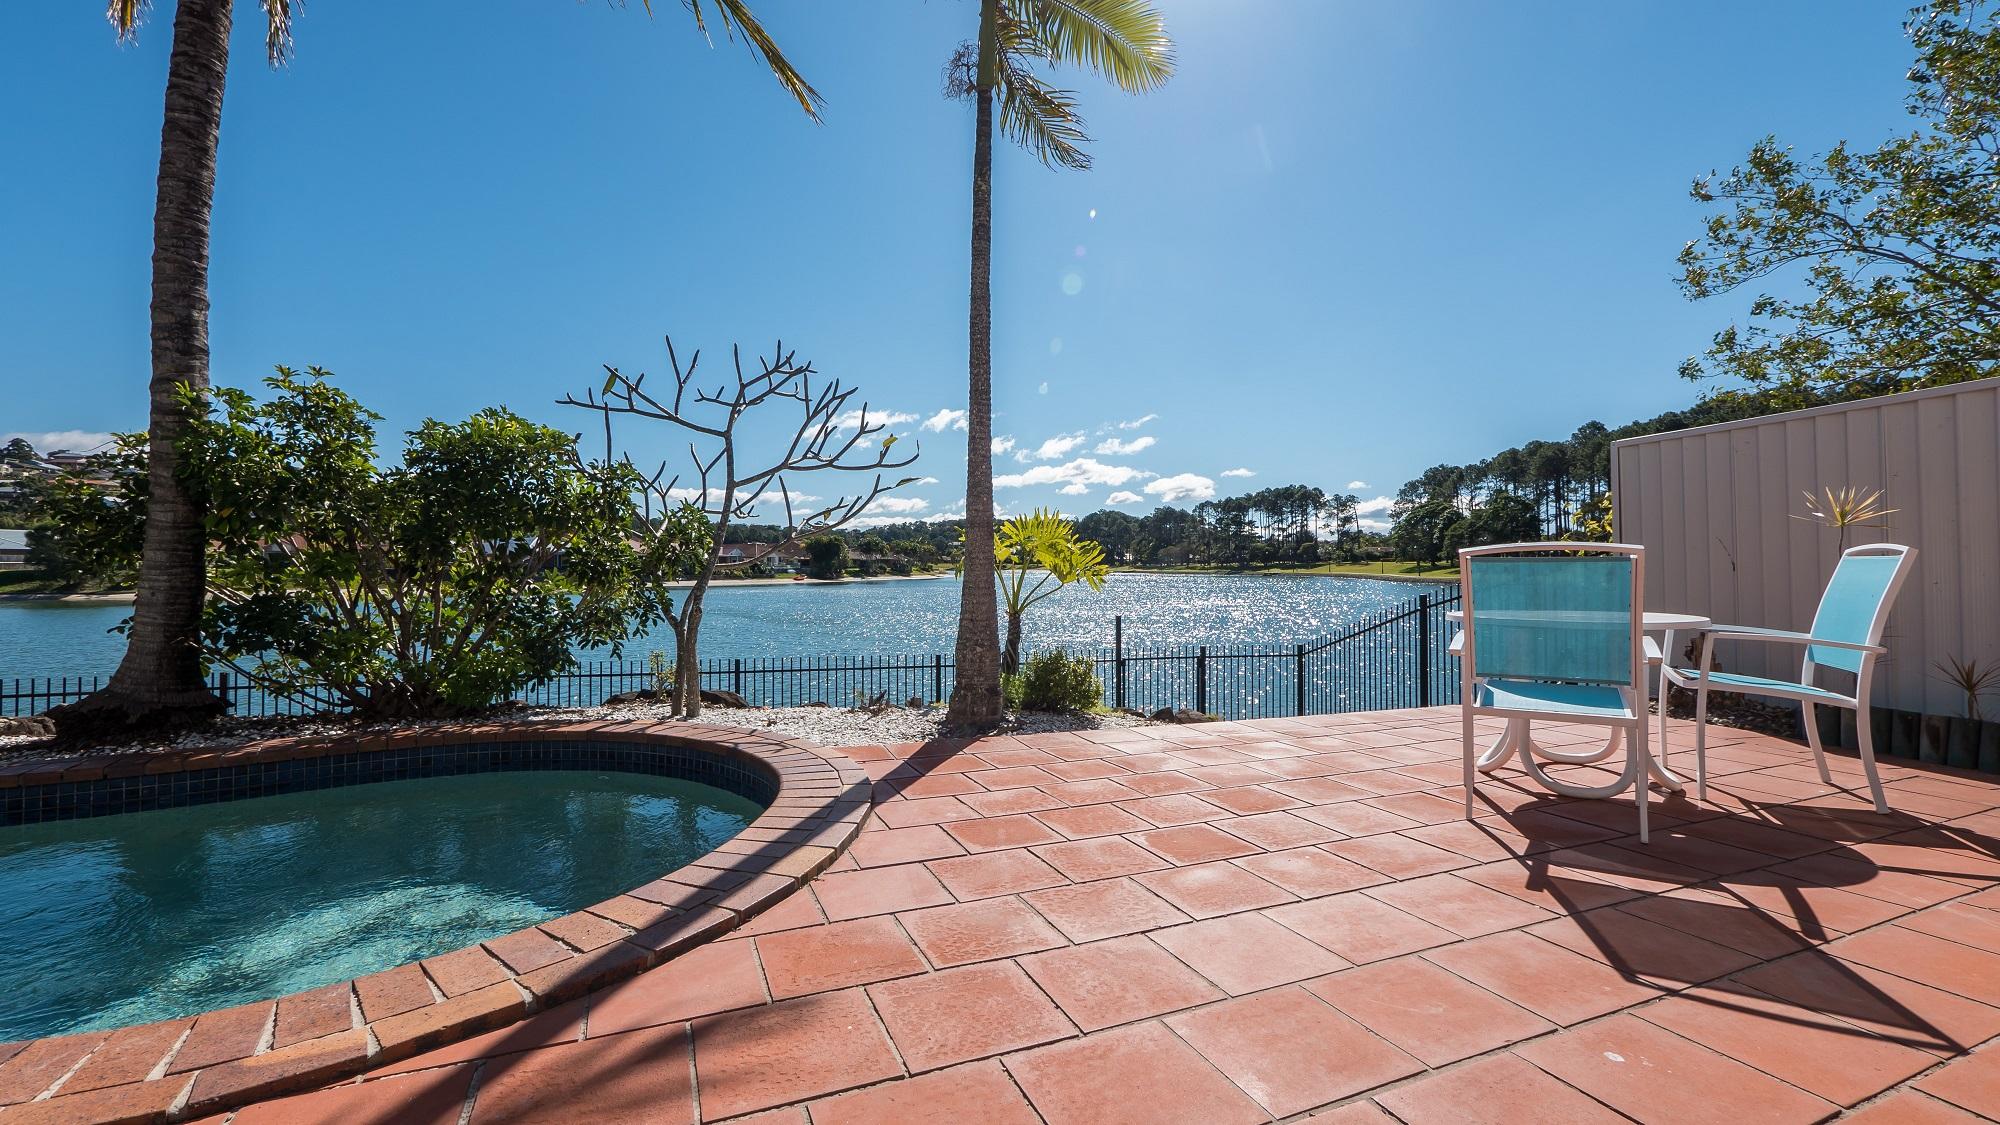 Isle of Palms Resort Facilities - Waterfront Pool